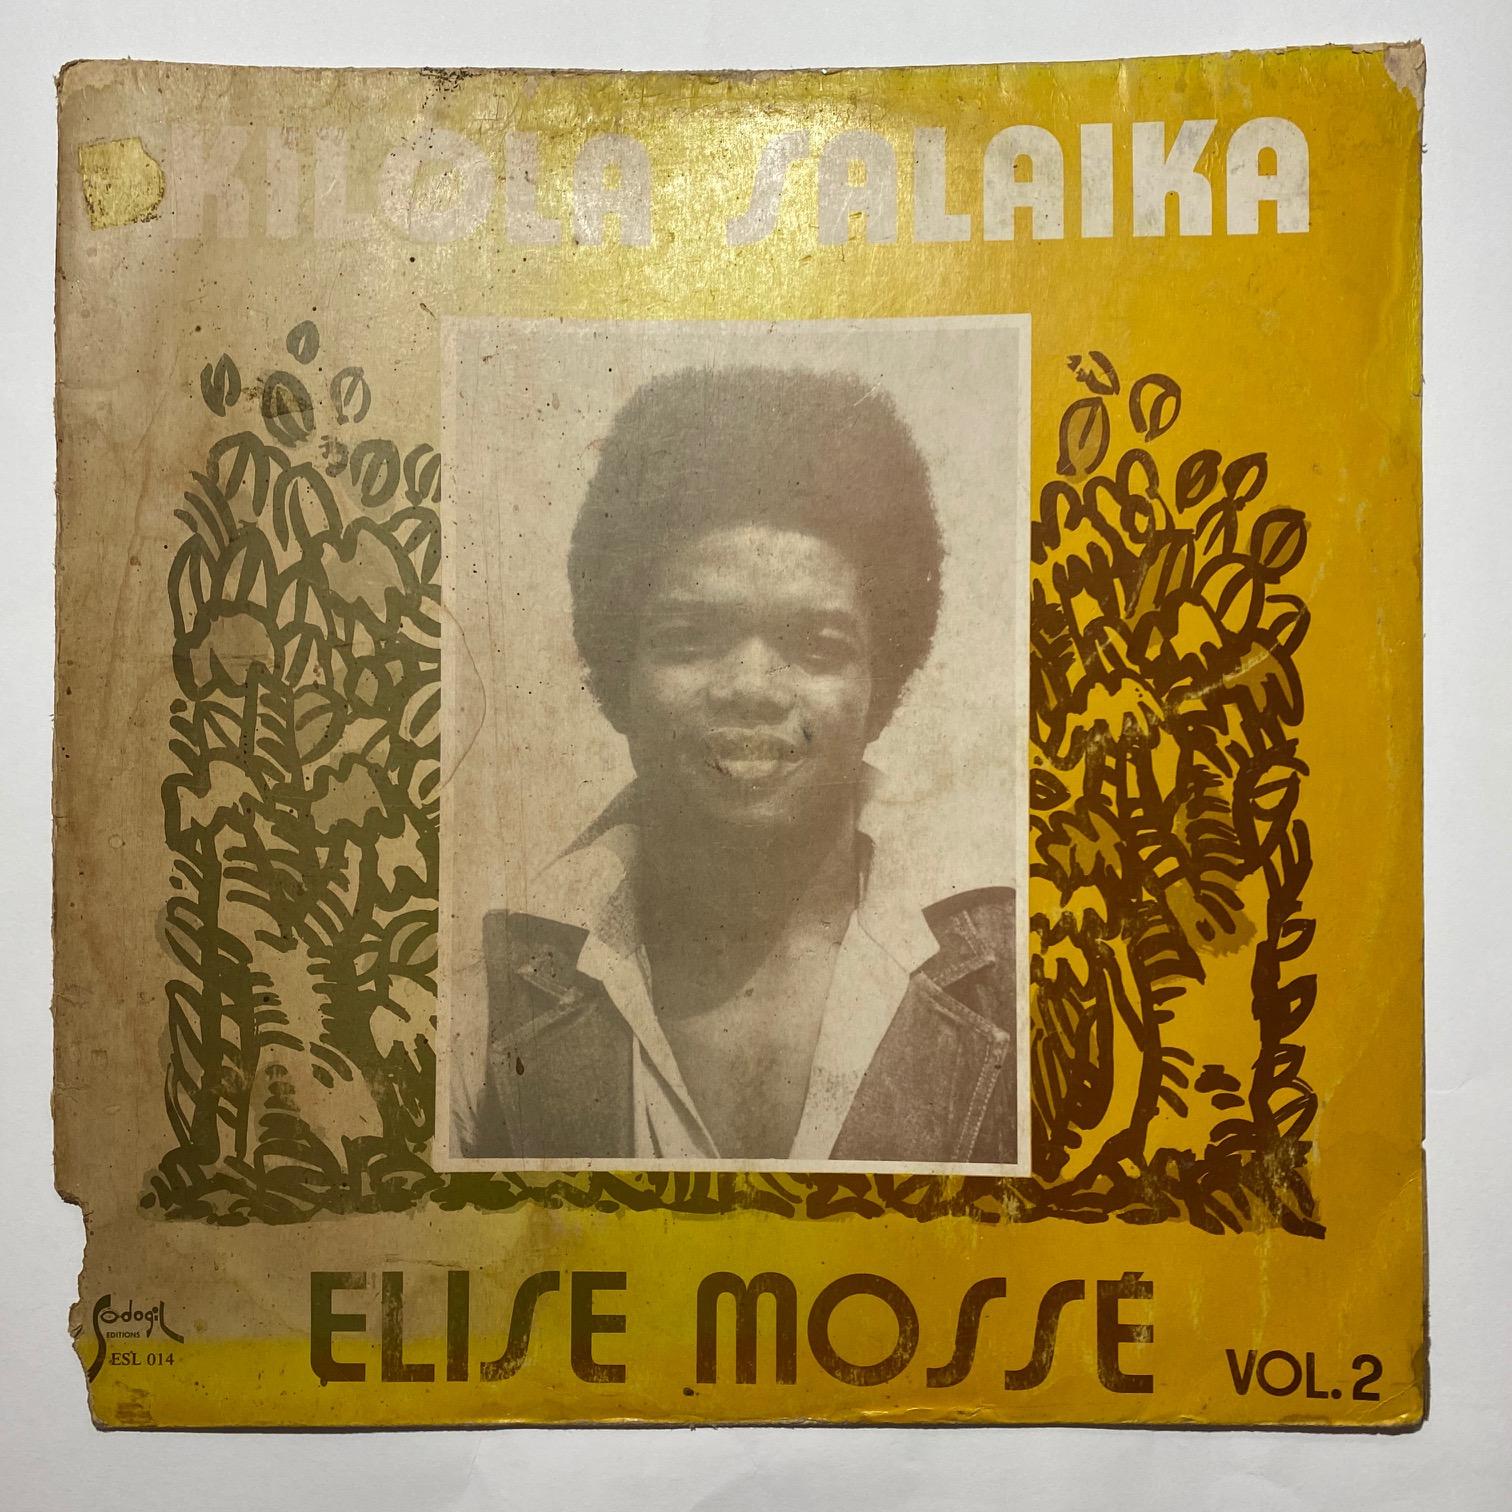 KILOLA SALAIKA - Elise mosse Vol.2 - 33T